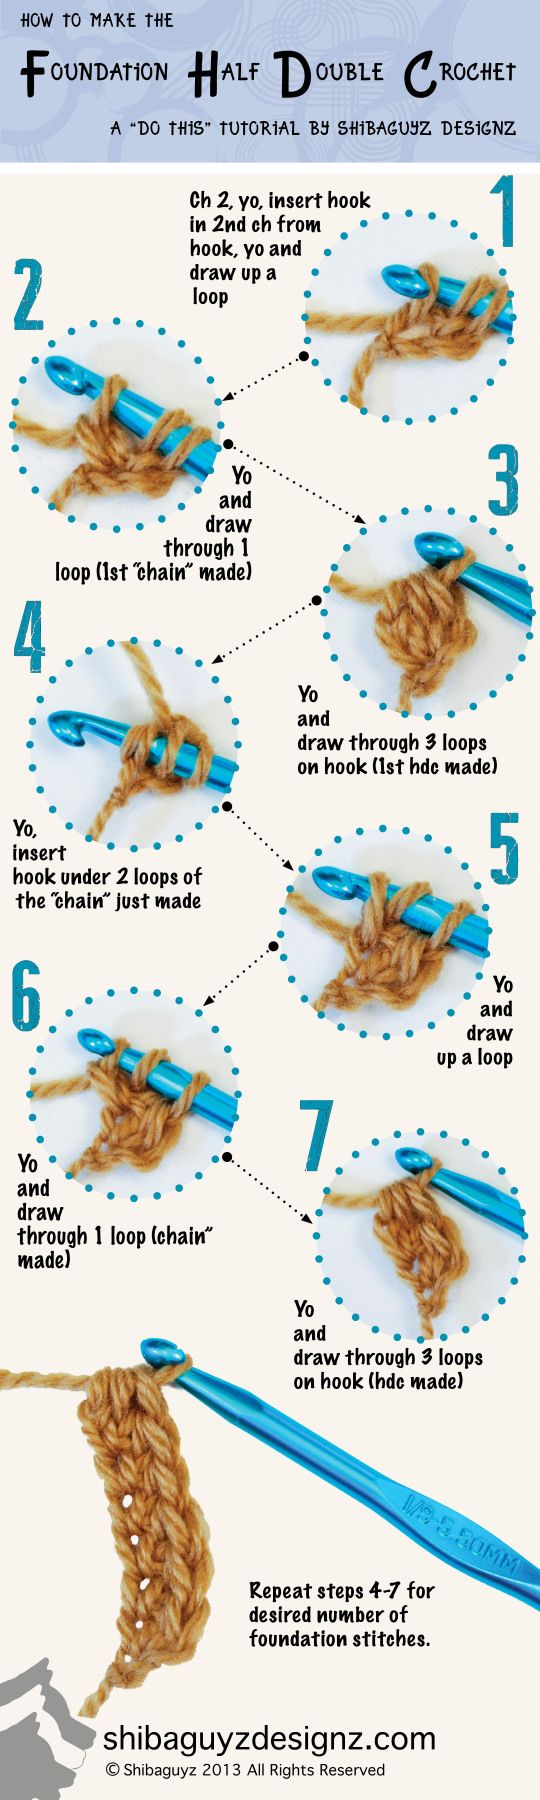 Punto Doble Crochet Patrones Crochet Foundation Half Double Crochet Hdc Crochet Double Crochet